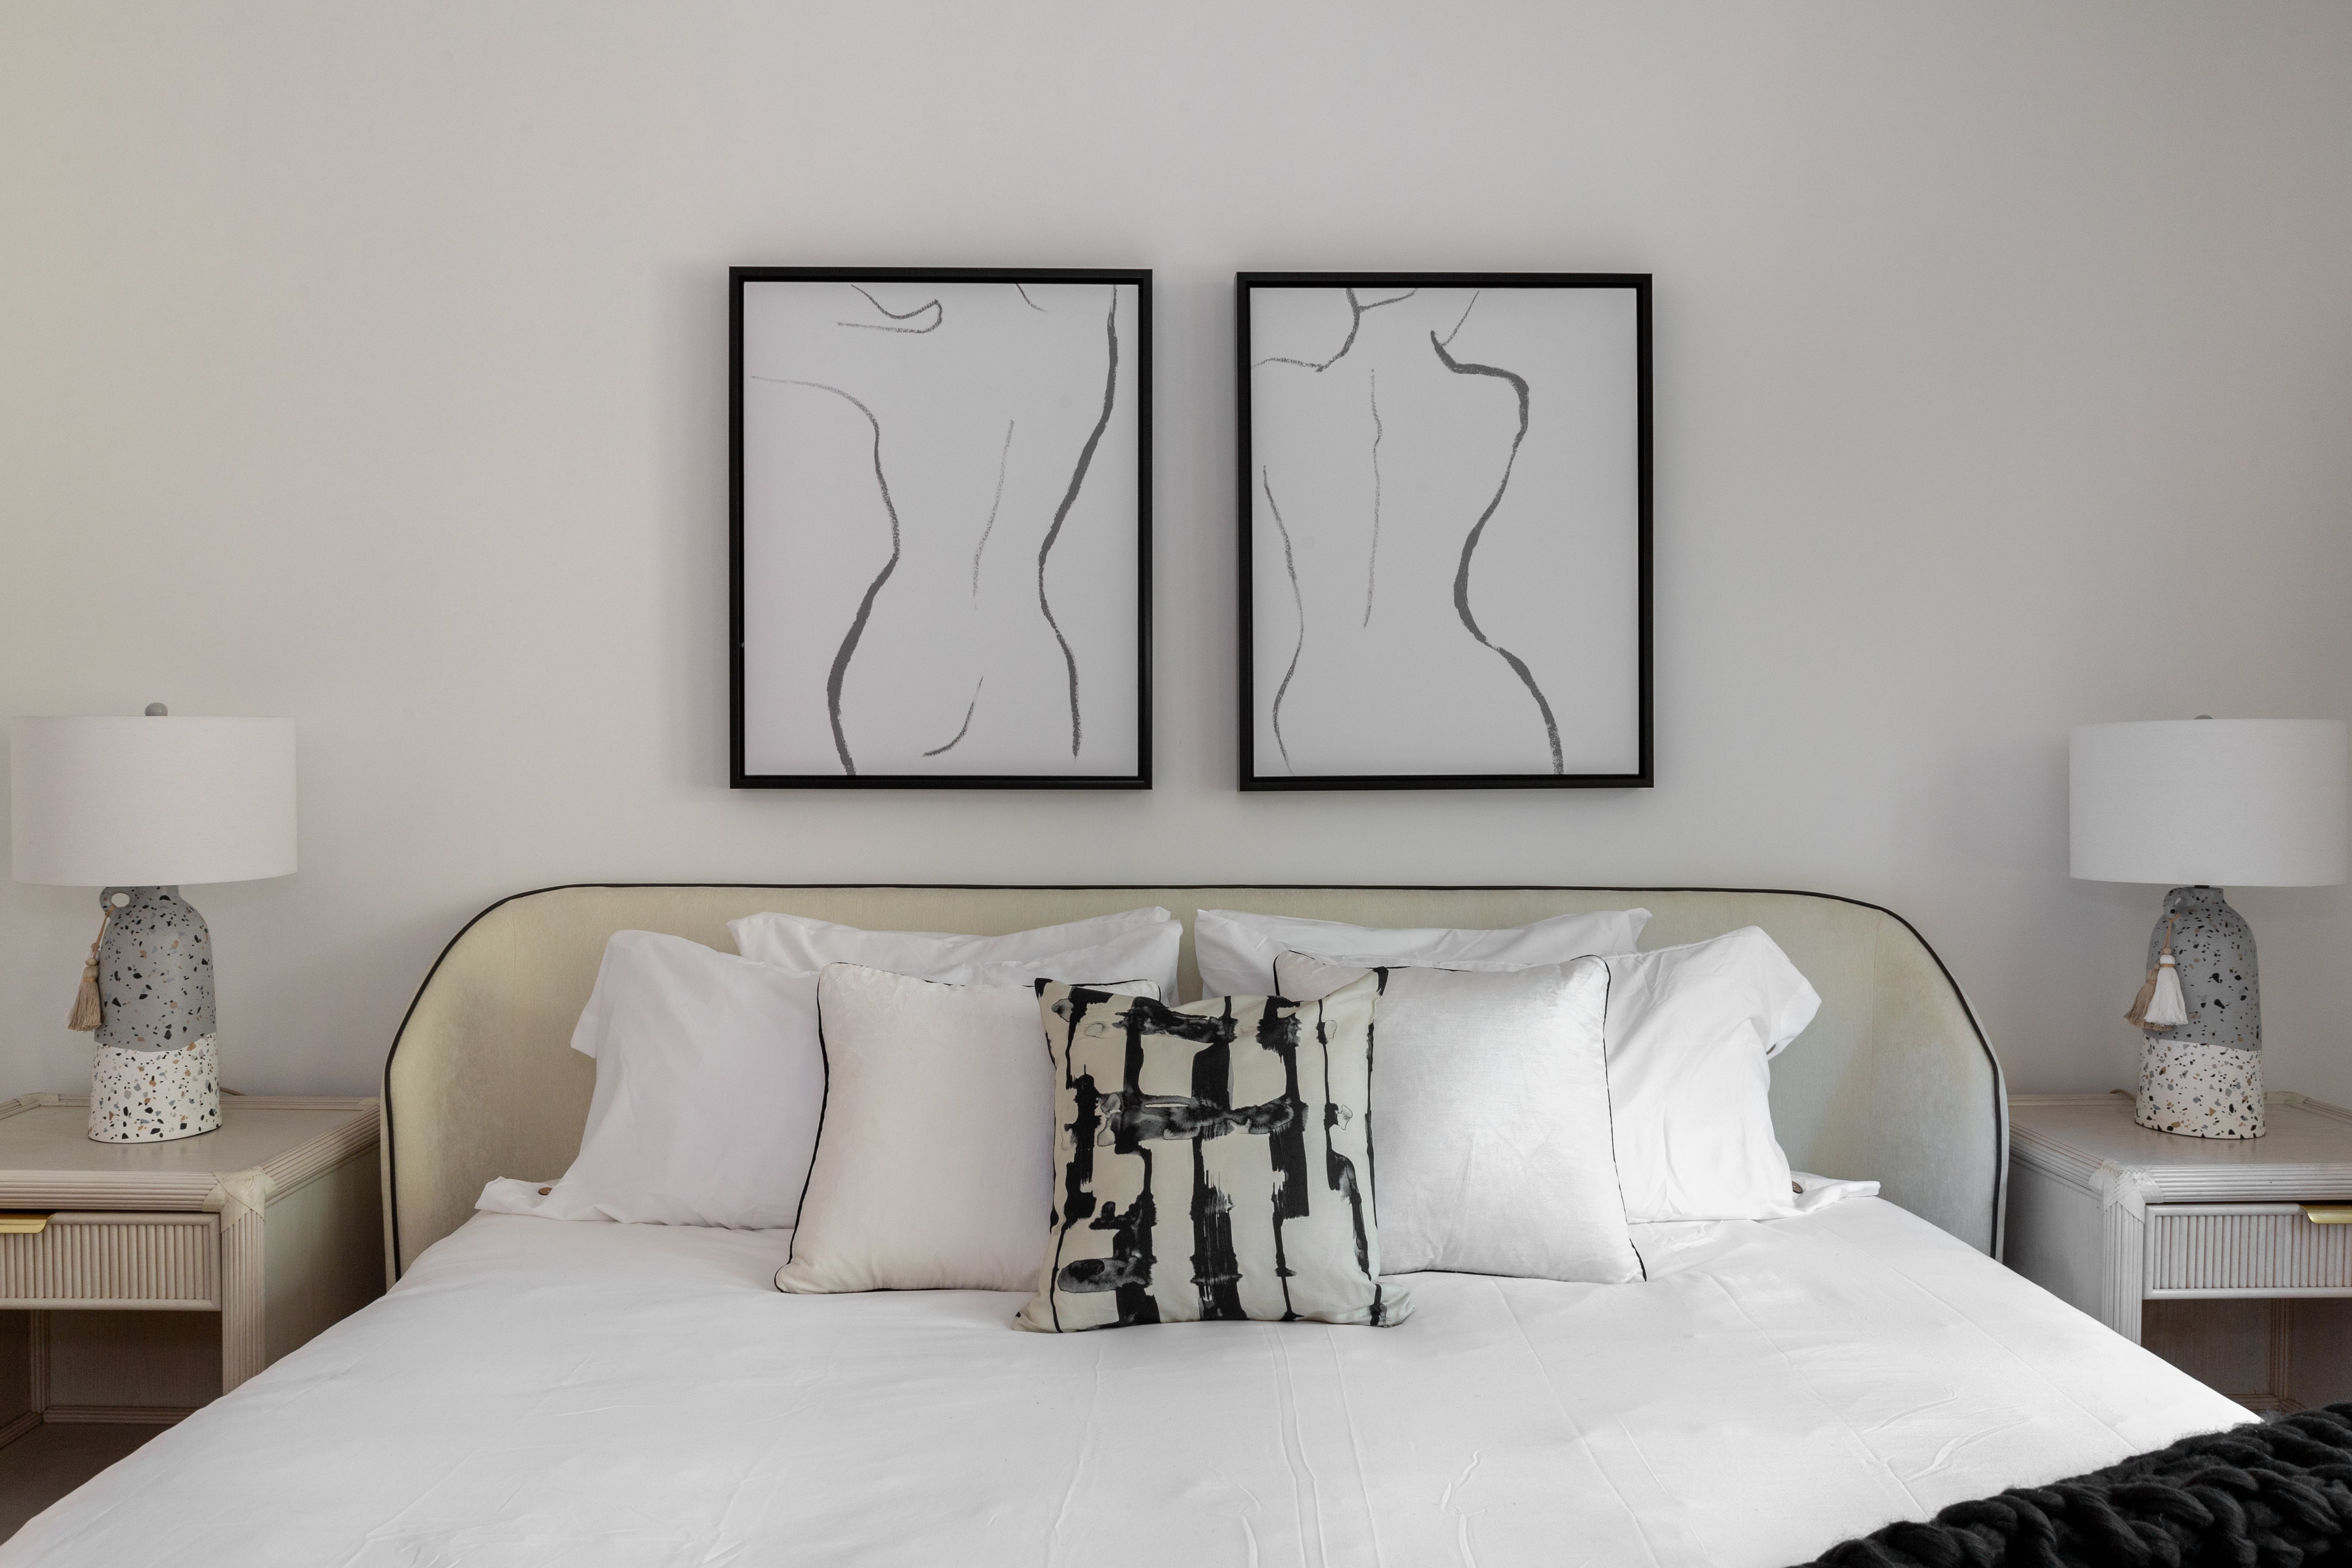 04 master bedroom 20210721-IMG_0101-HDR.jpg